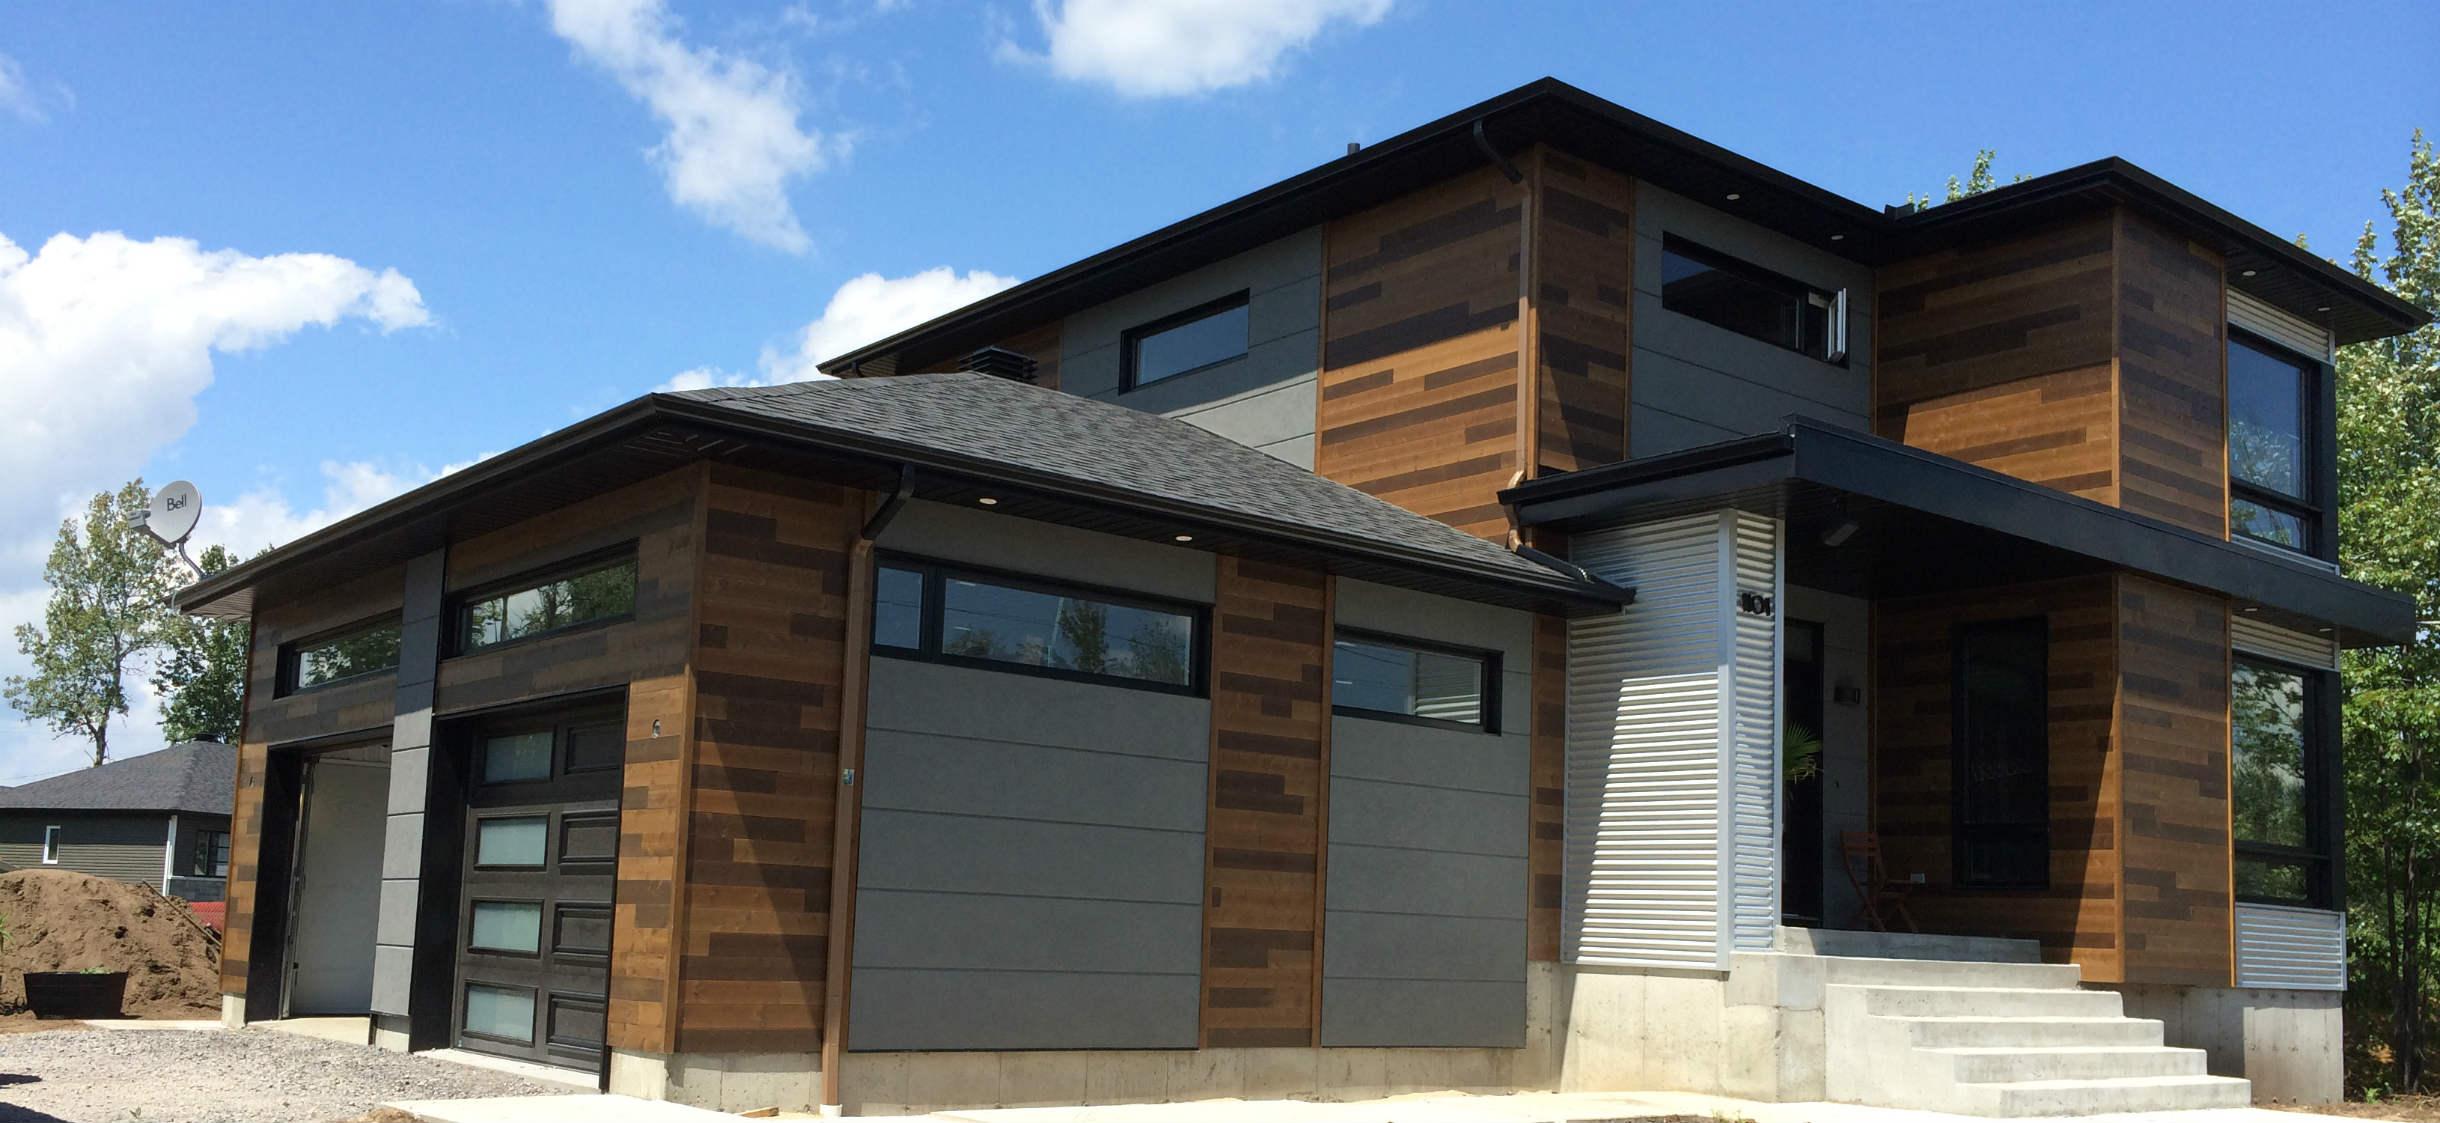 Construction M.V.J. 2012 Inc.